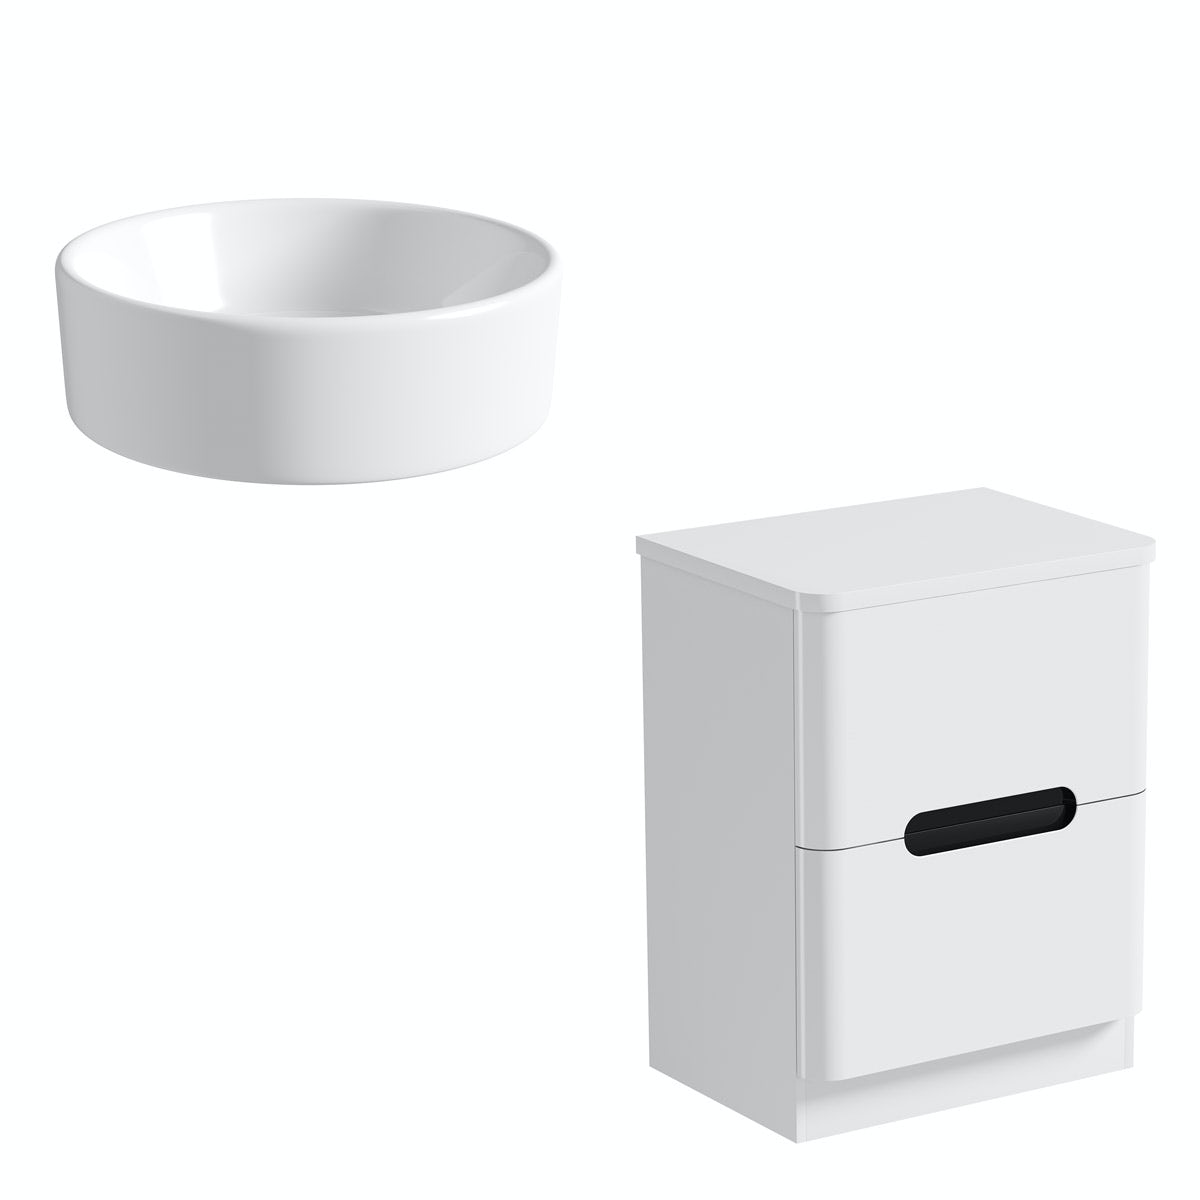 Mode Ellis essen countertop drawer unit 600mm with Calhoun basin